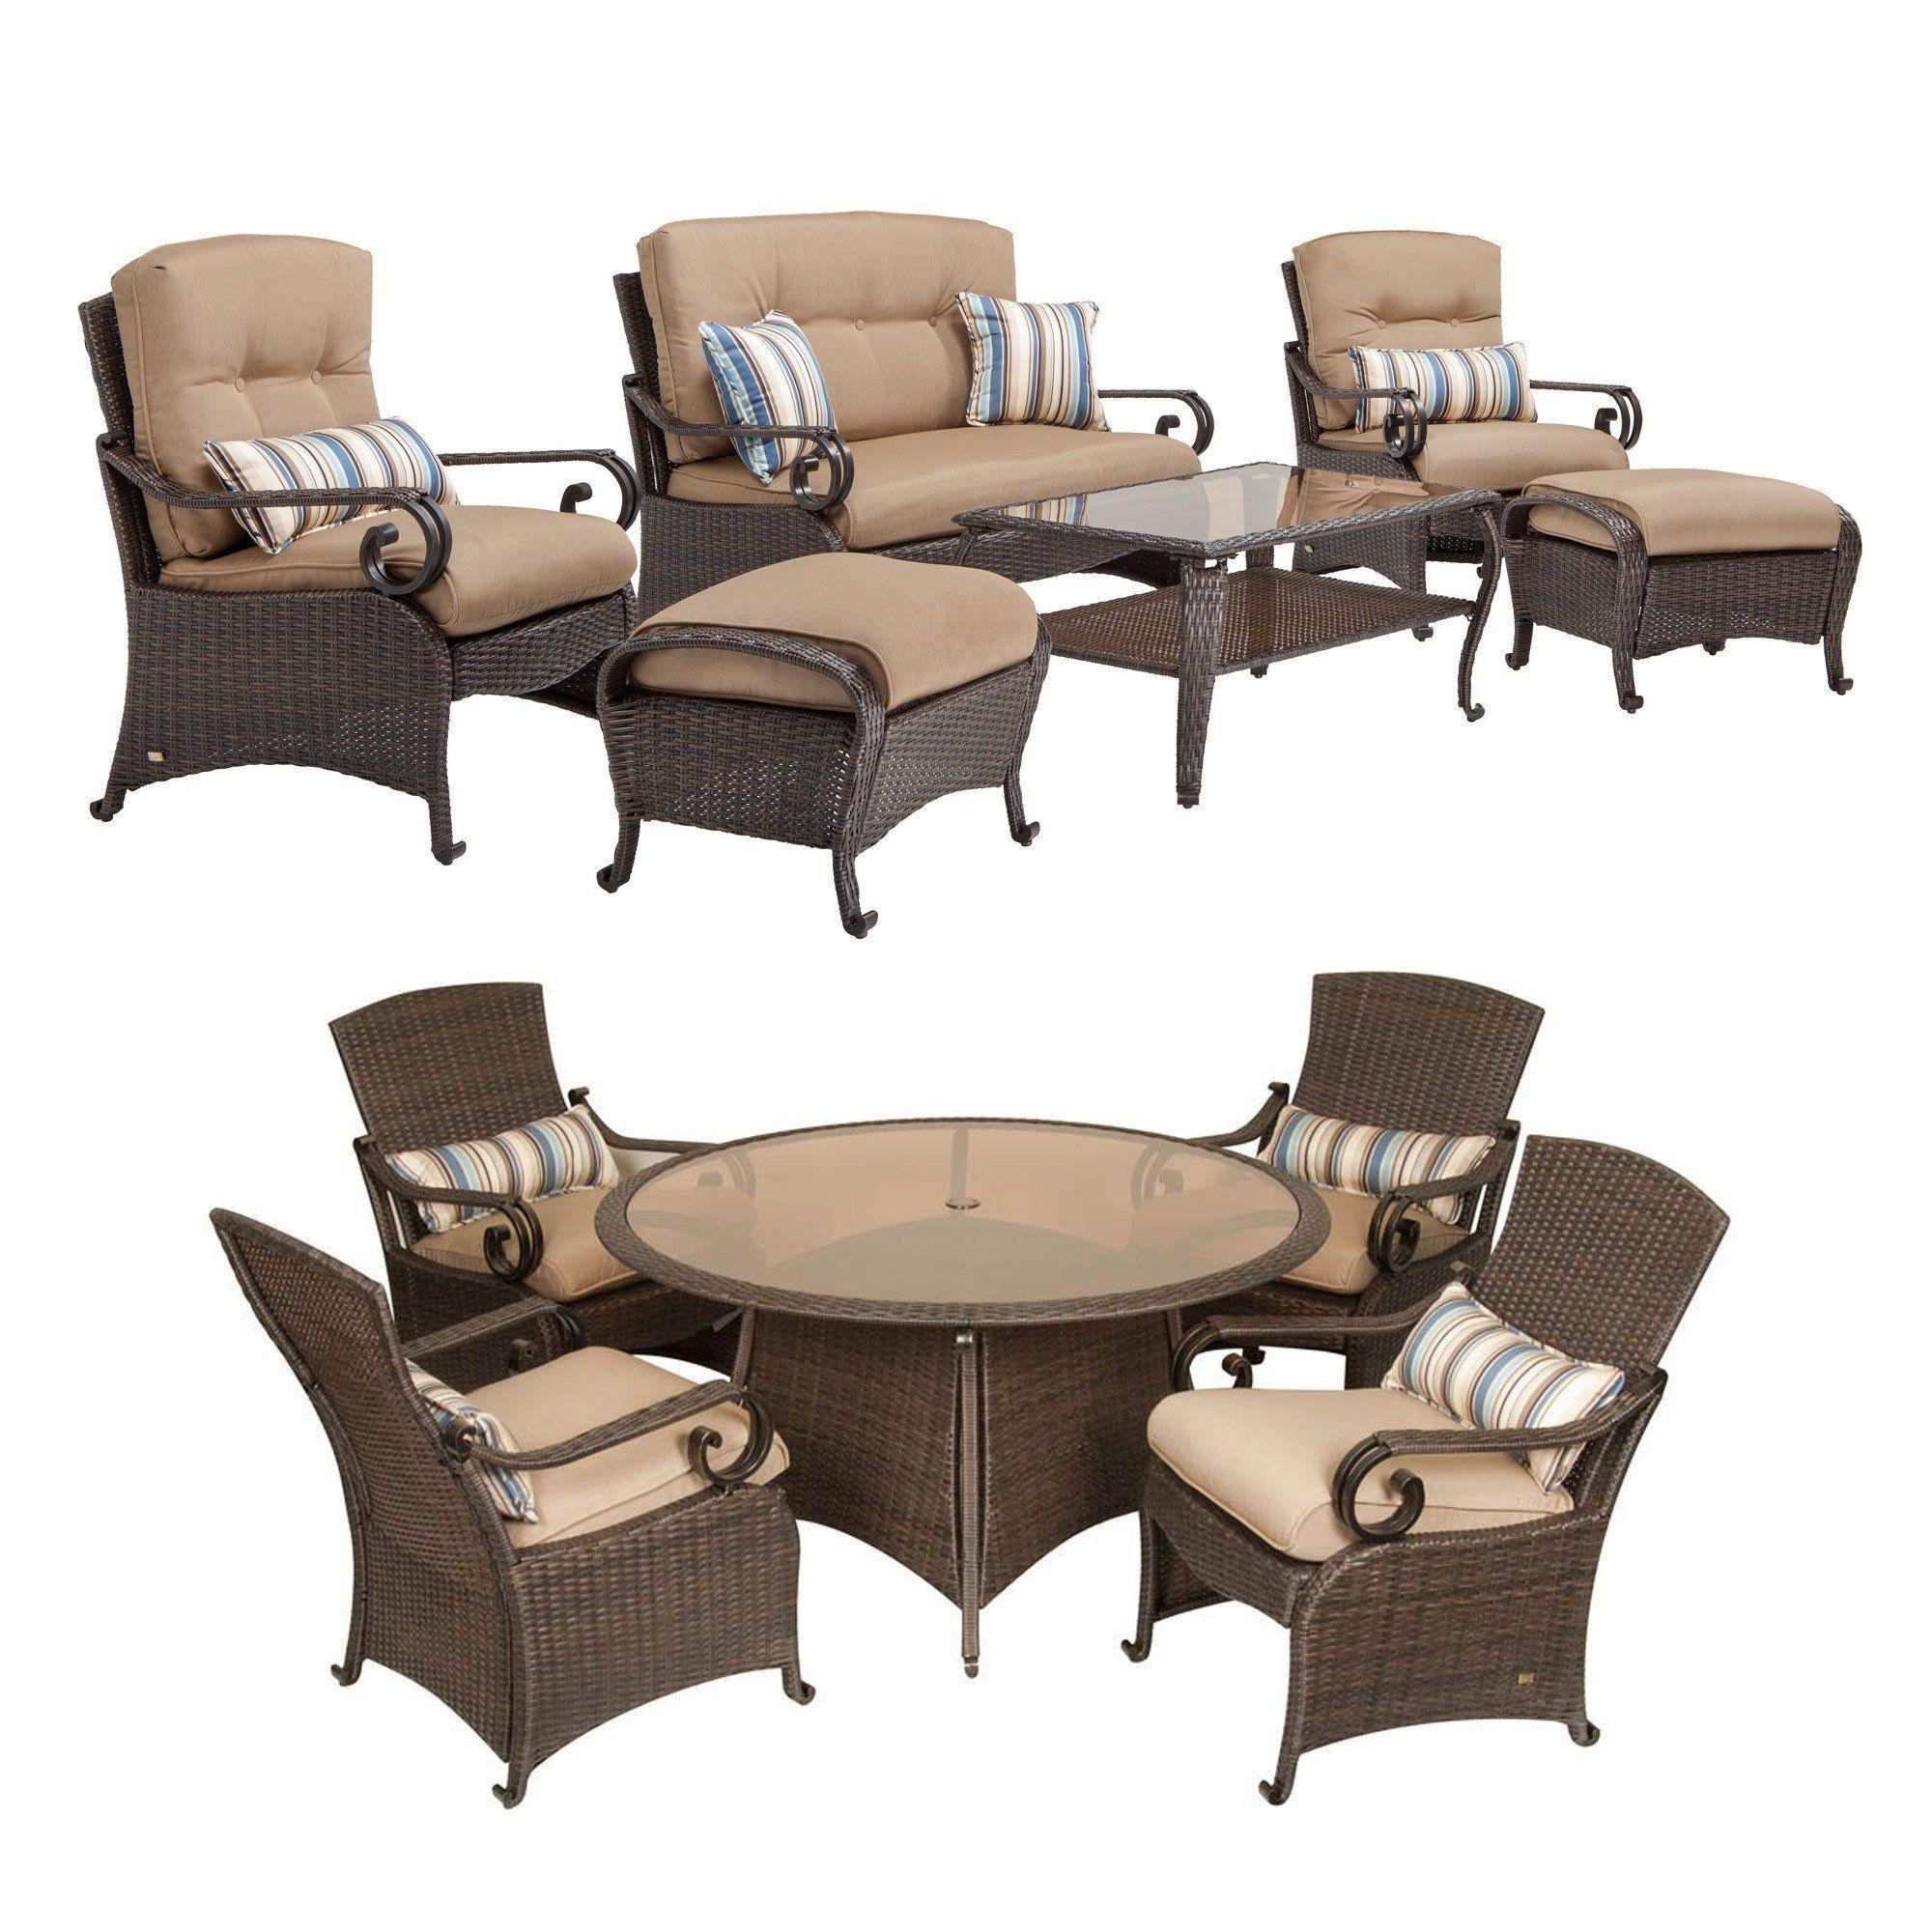 La Z Boy Outdoor Lake o Resin Wicker Patio Furniture bo 6